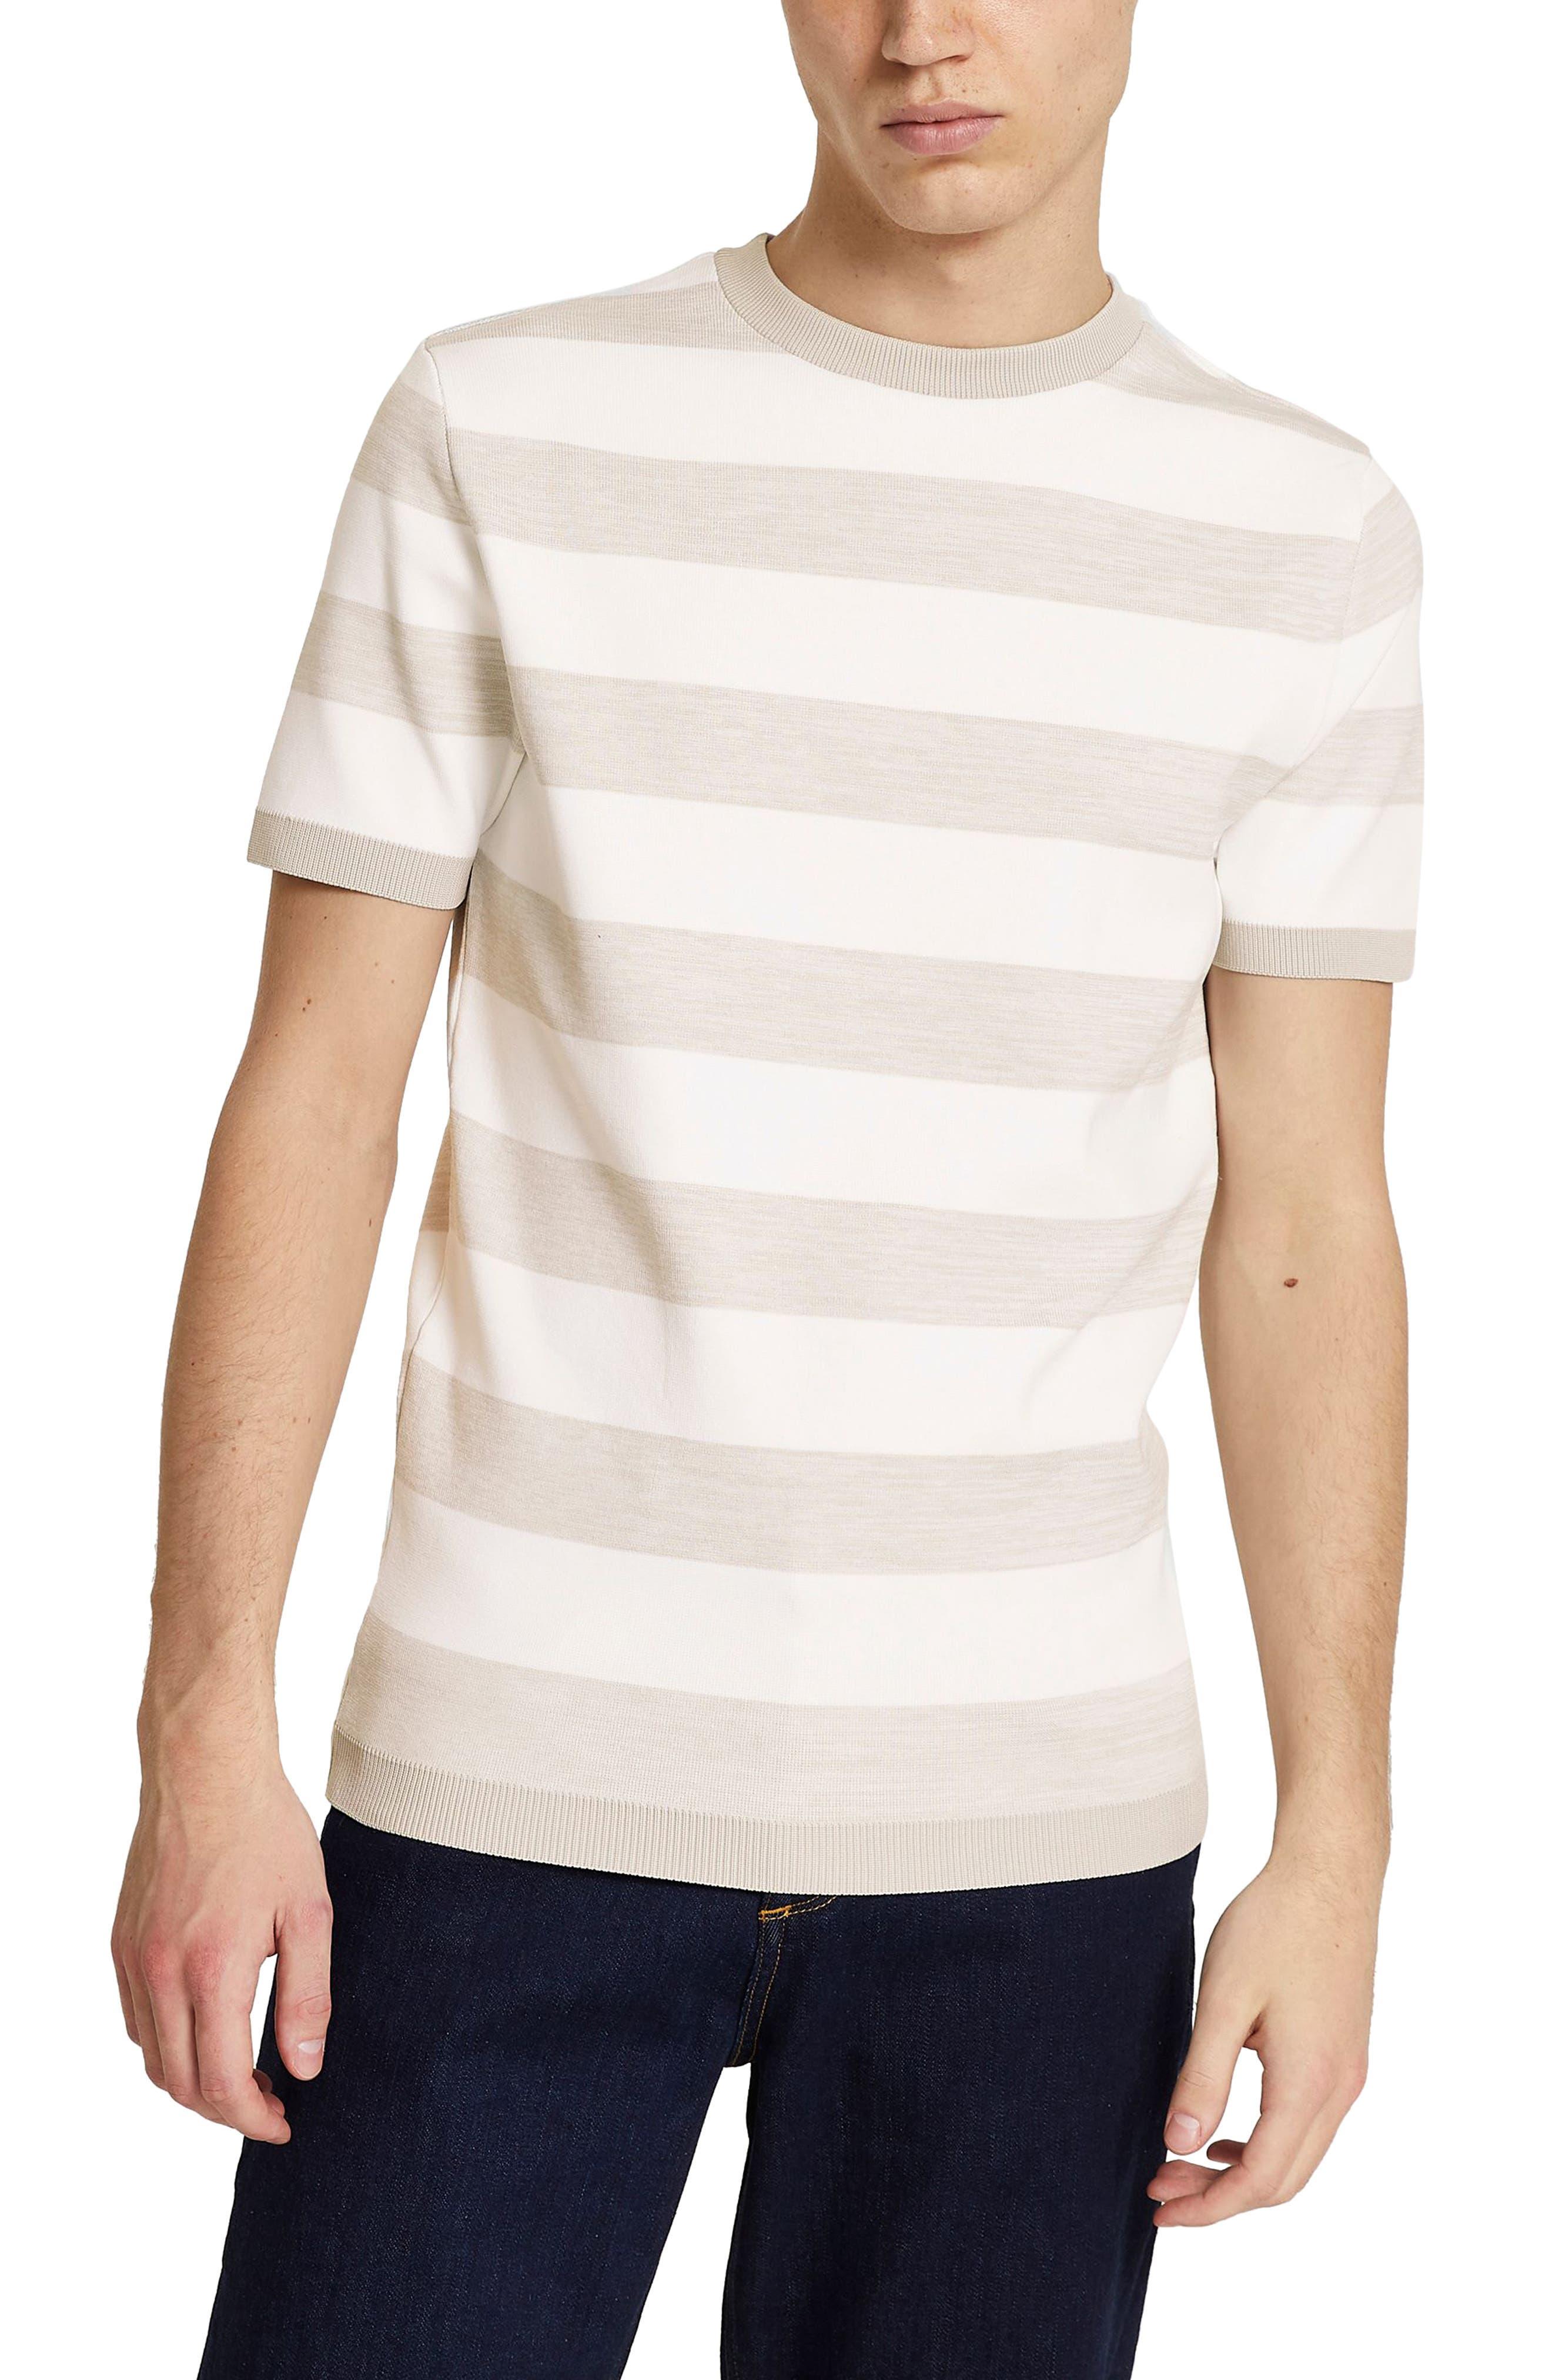 1950s Mens Shirts | Retro Bowling Shirts, Vintage Hawaiian Shirts Mens River Island Space Dye Stripe Short Sleeve Sweater Size Large - Beige $45.00 AT vintagedancer.com